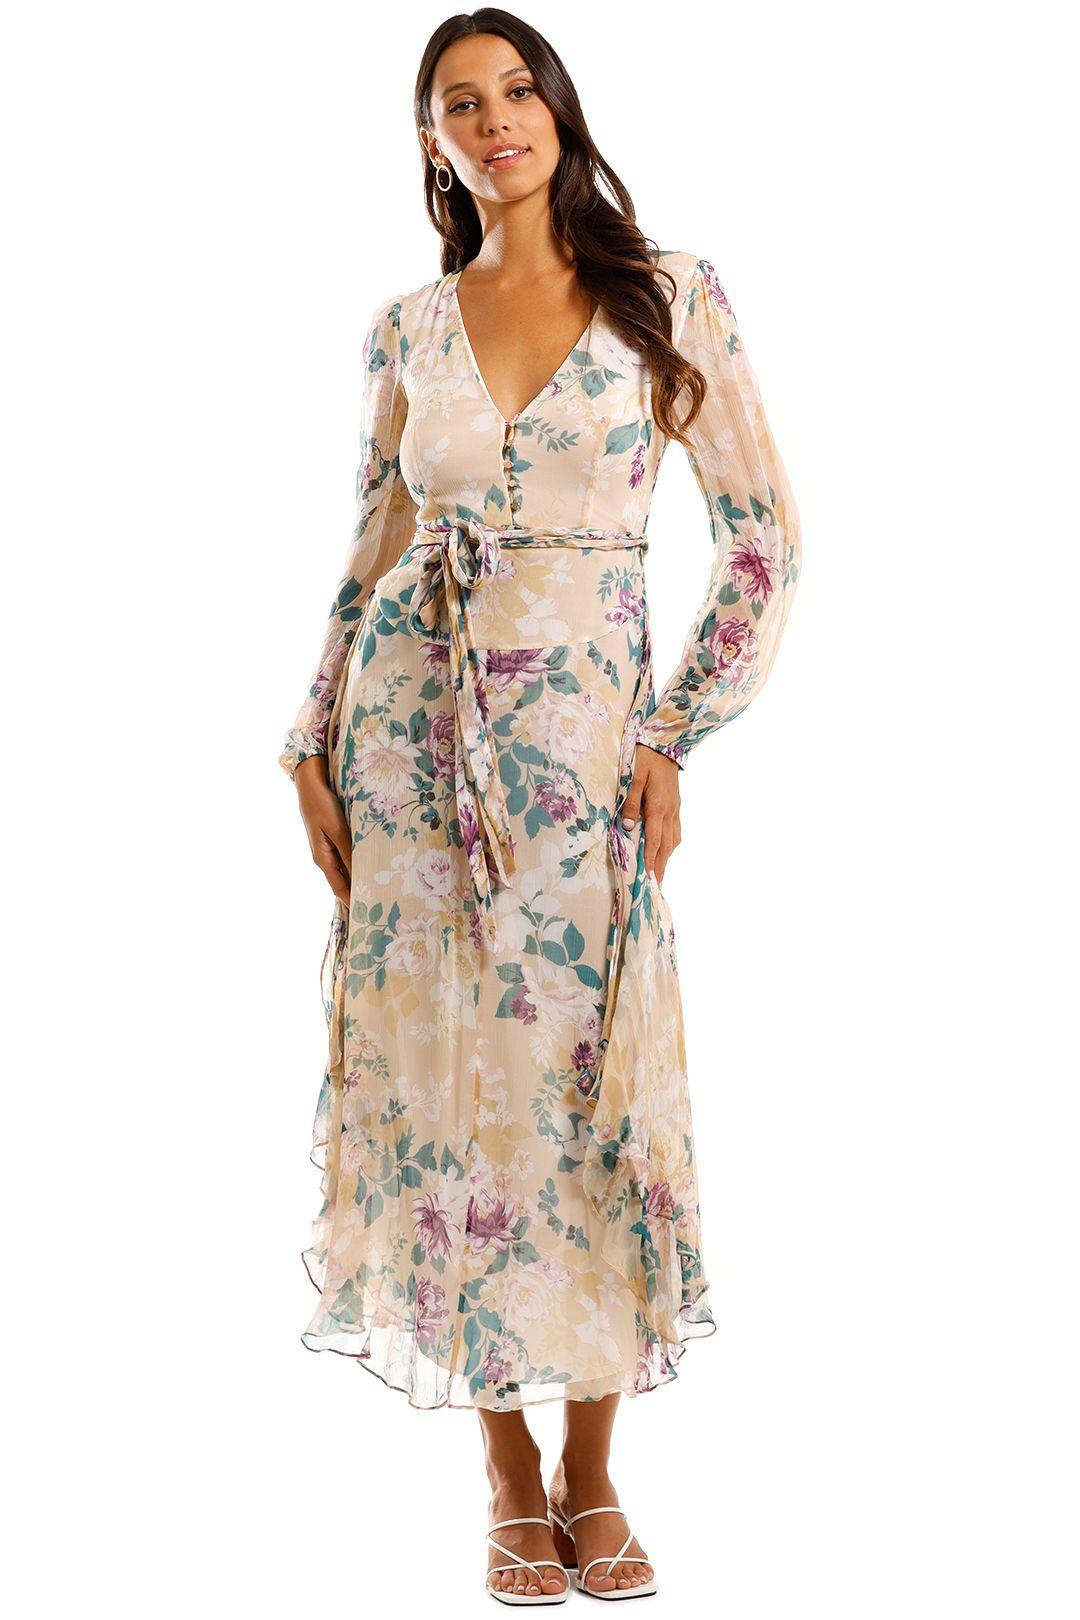 Shona Joy Donatella Long Sleeve Midi Dress